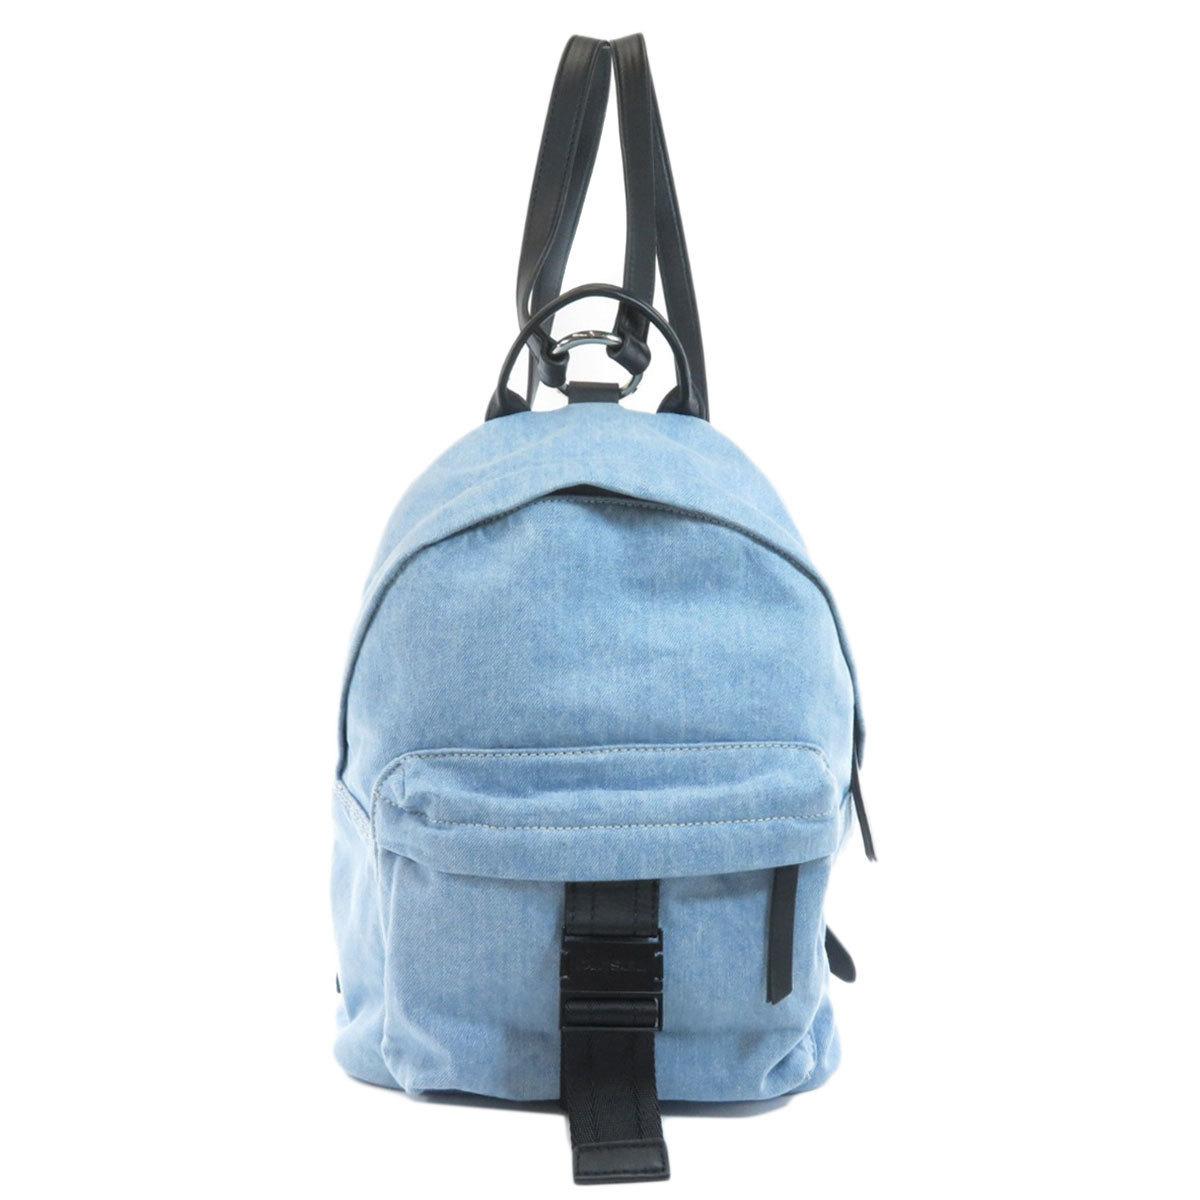 Diesel logo motif rucksack daypack denim ladies